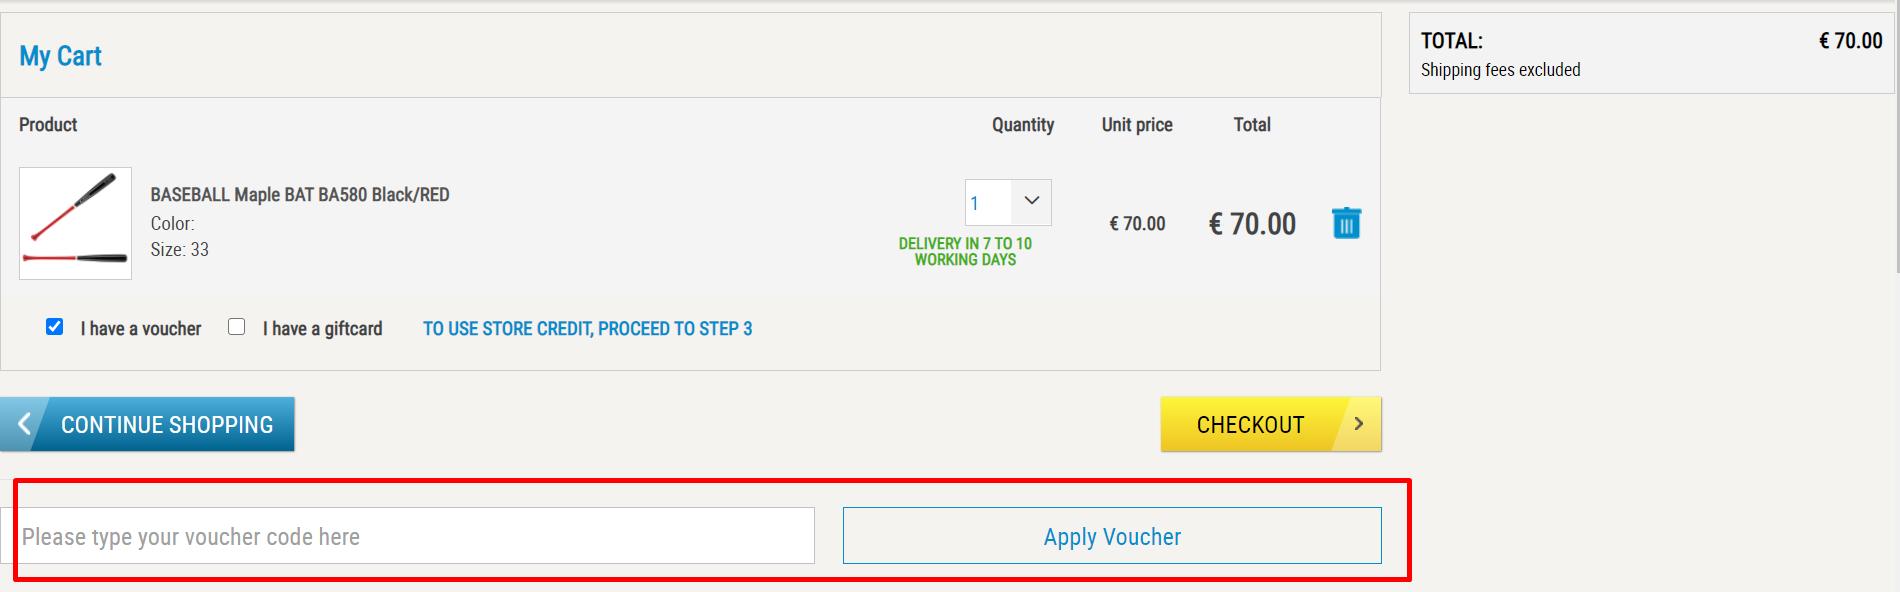 How do I use my Decathlon voucher code?